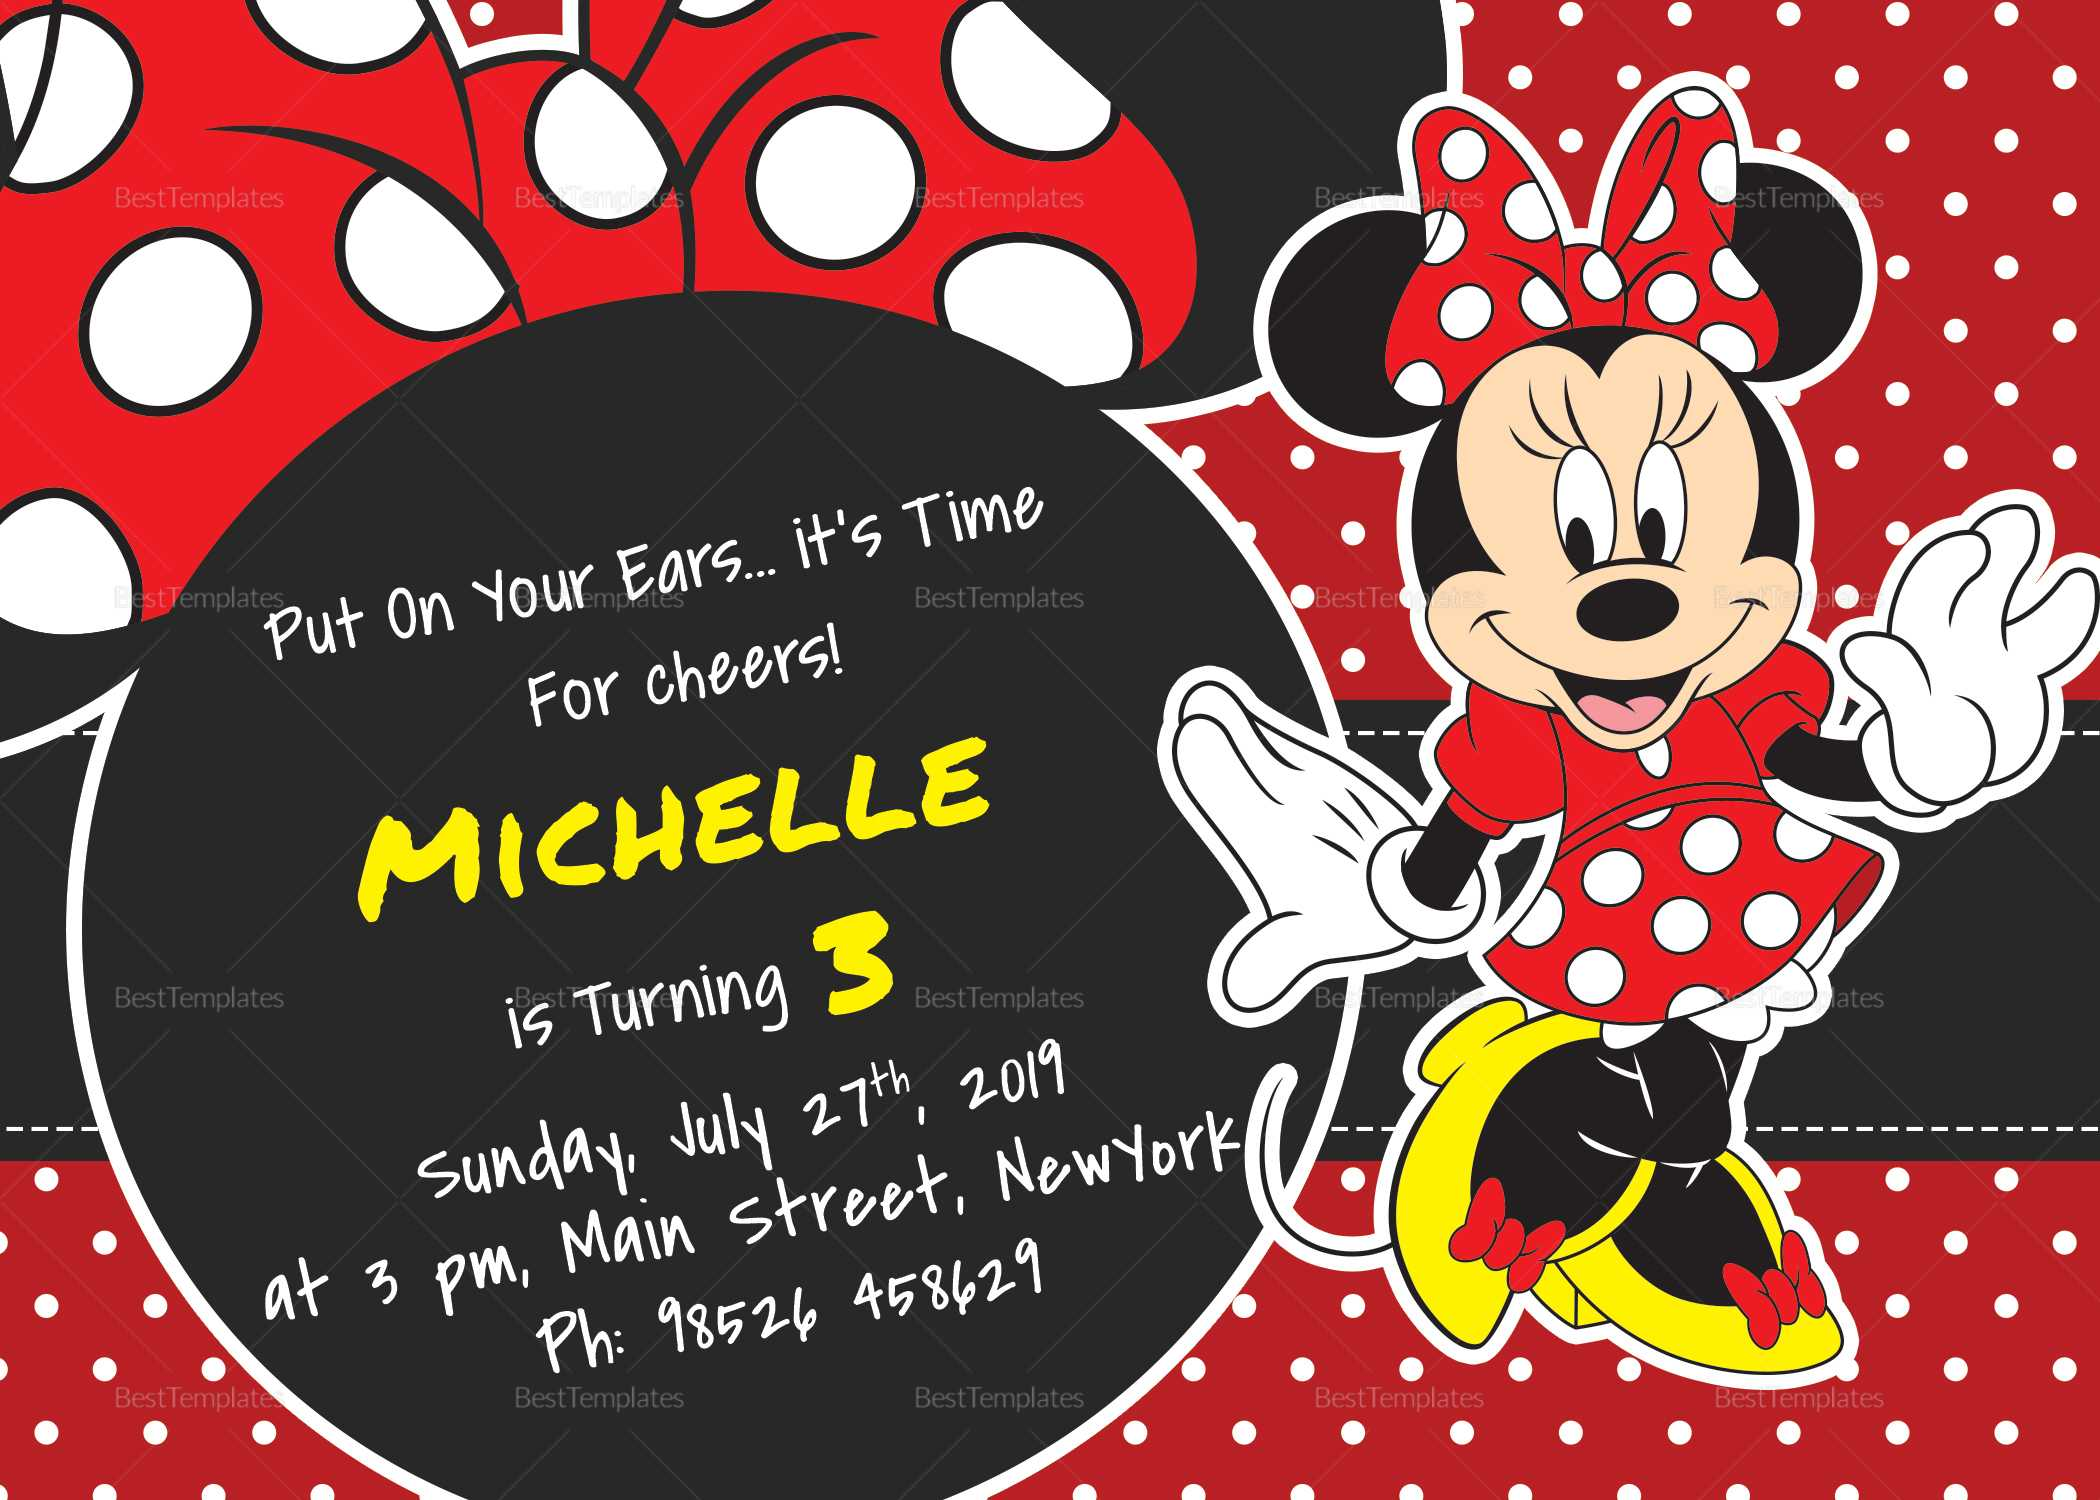 Rocking Minnie Mouse Birthday Invitation Card Template Regarding Minnie Mouse Card Templates